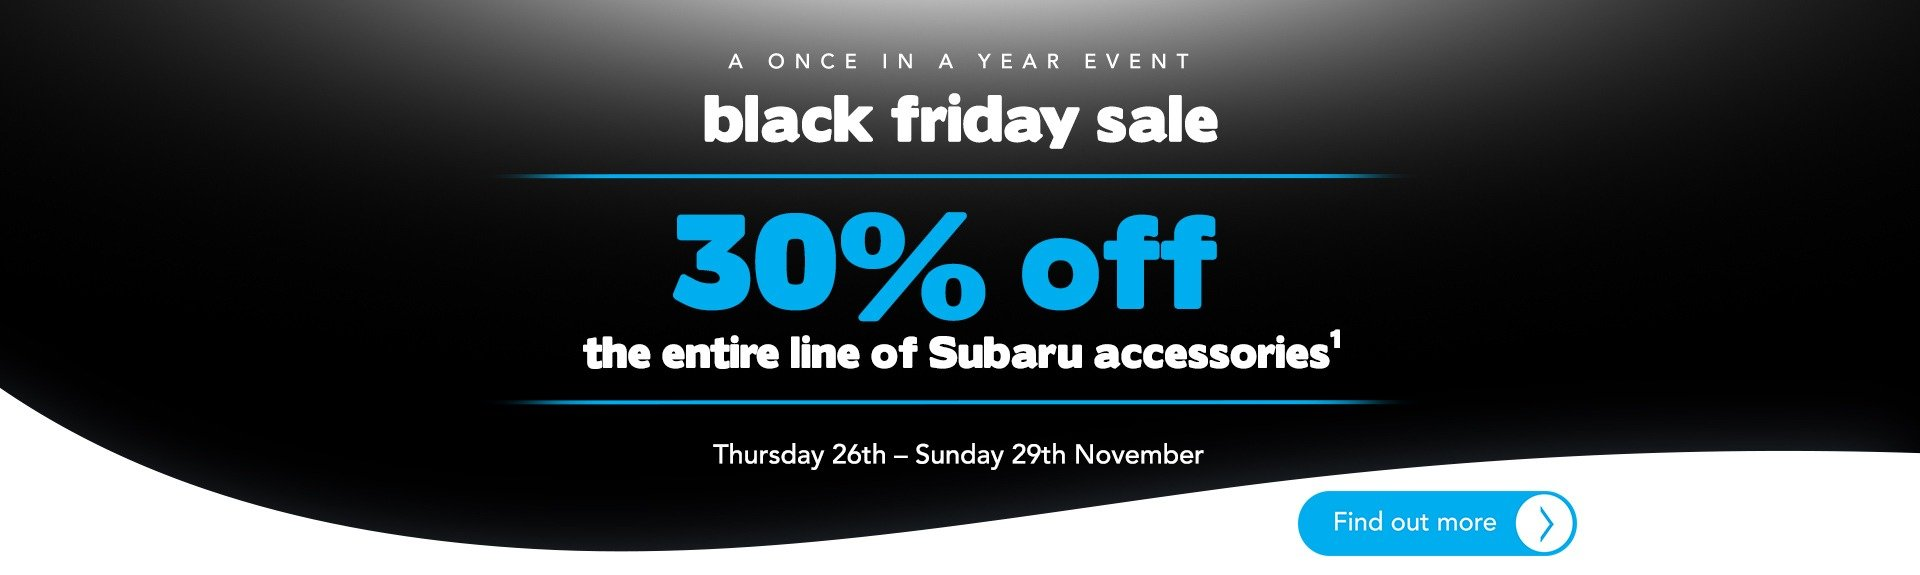 Trivett Subaru - Black Friday Sale